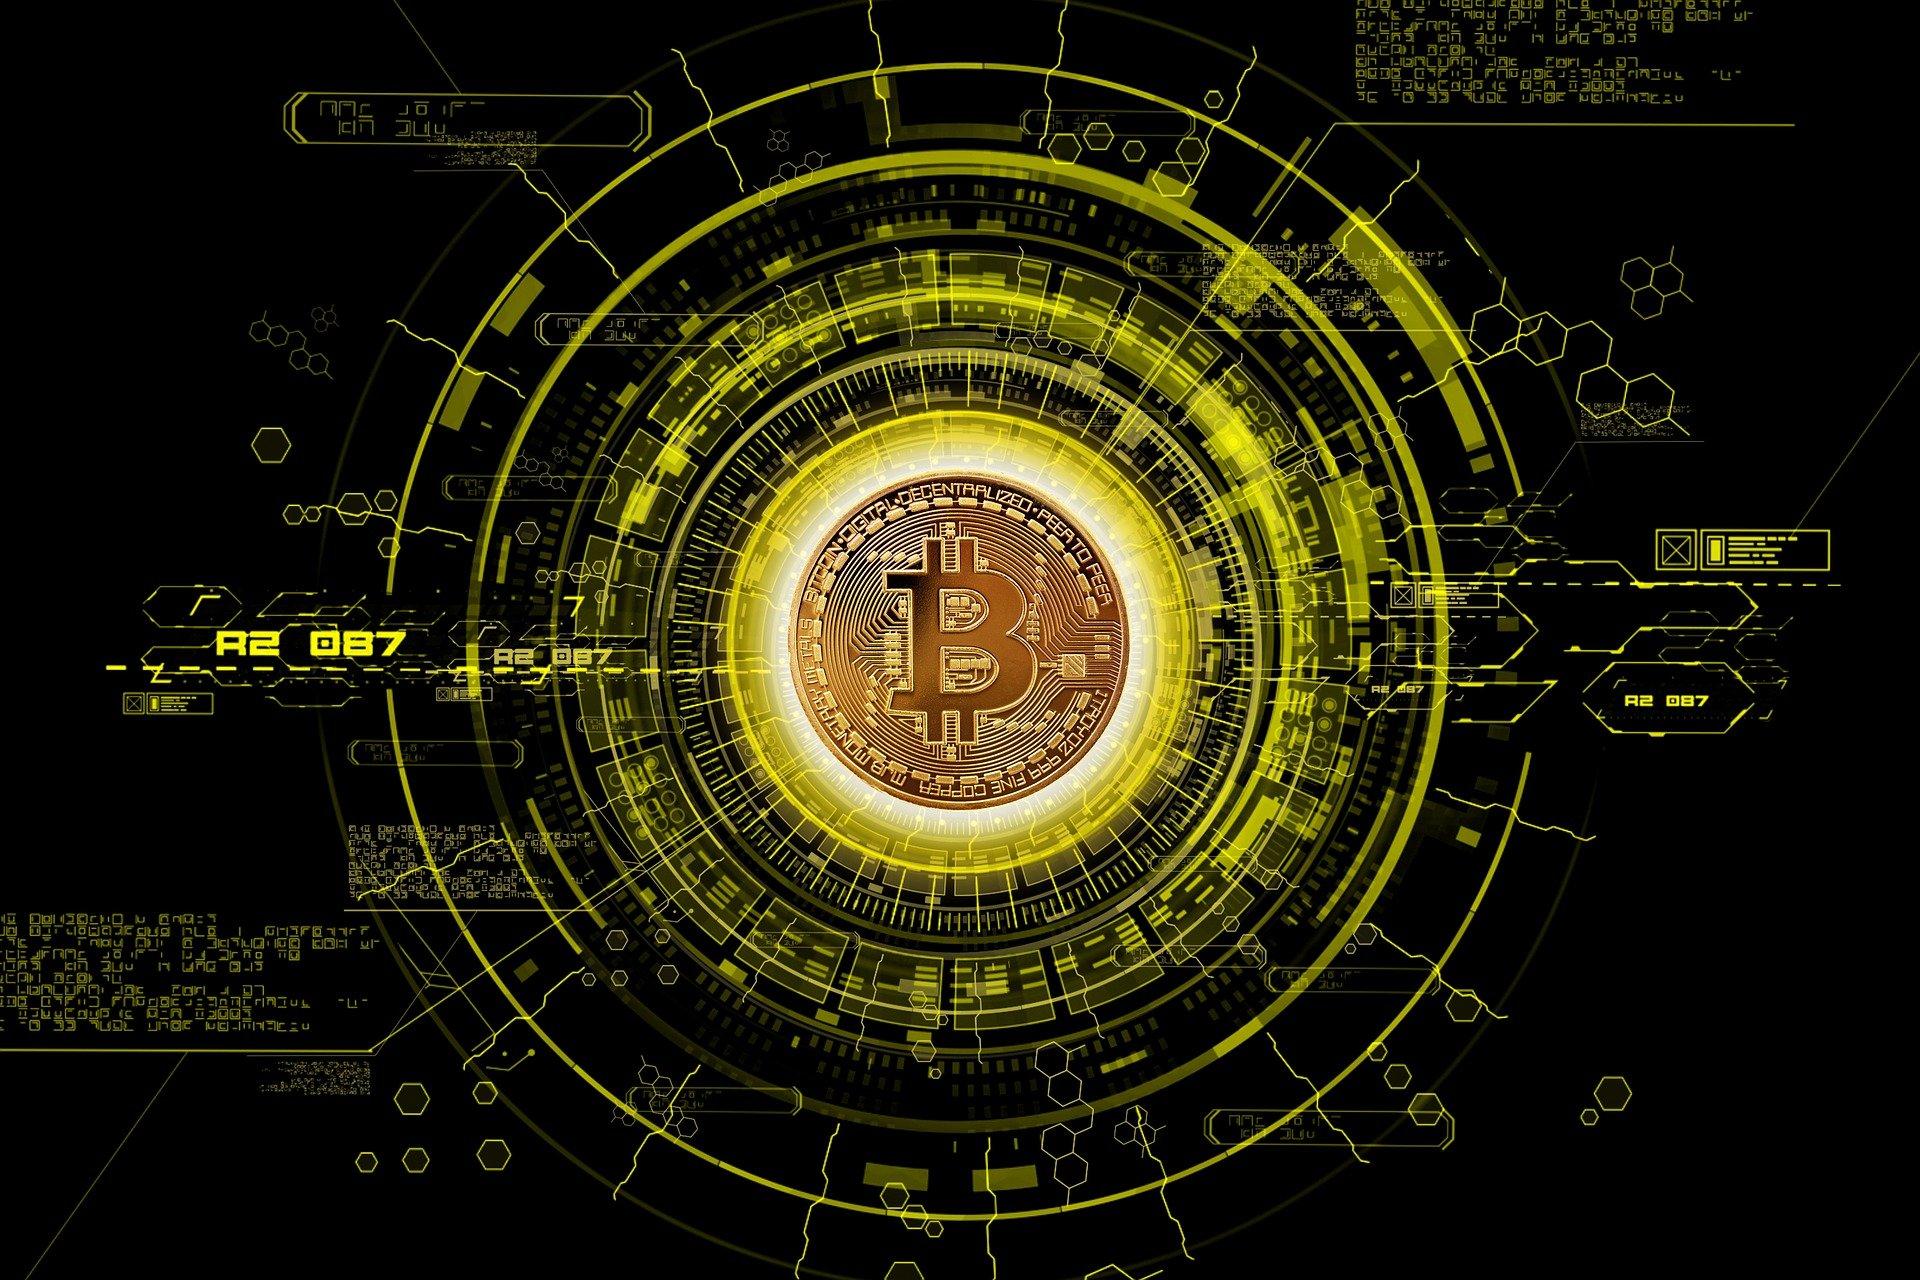 How blockchain works BTC, BCH, ETH, LanaCoin or other similar AltCoins